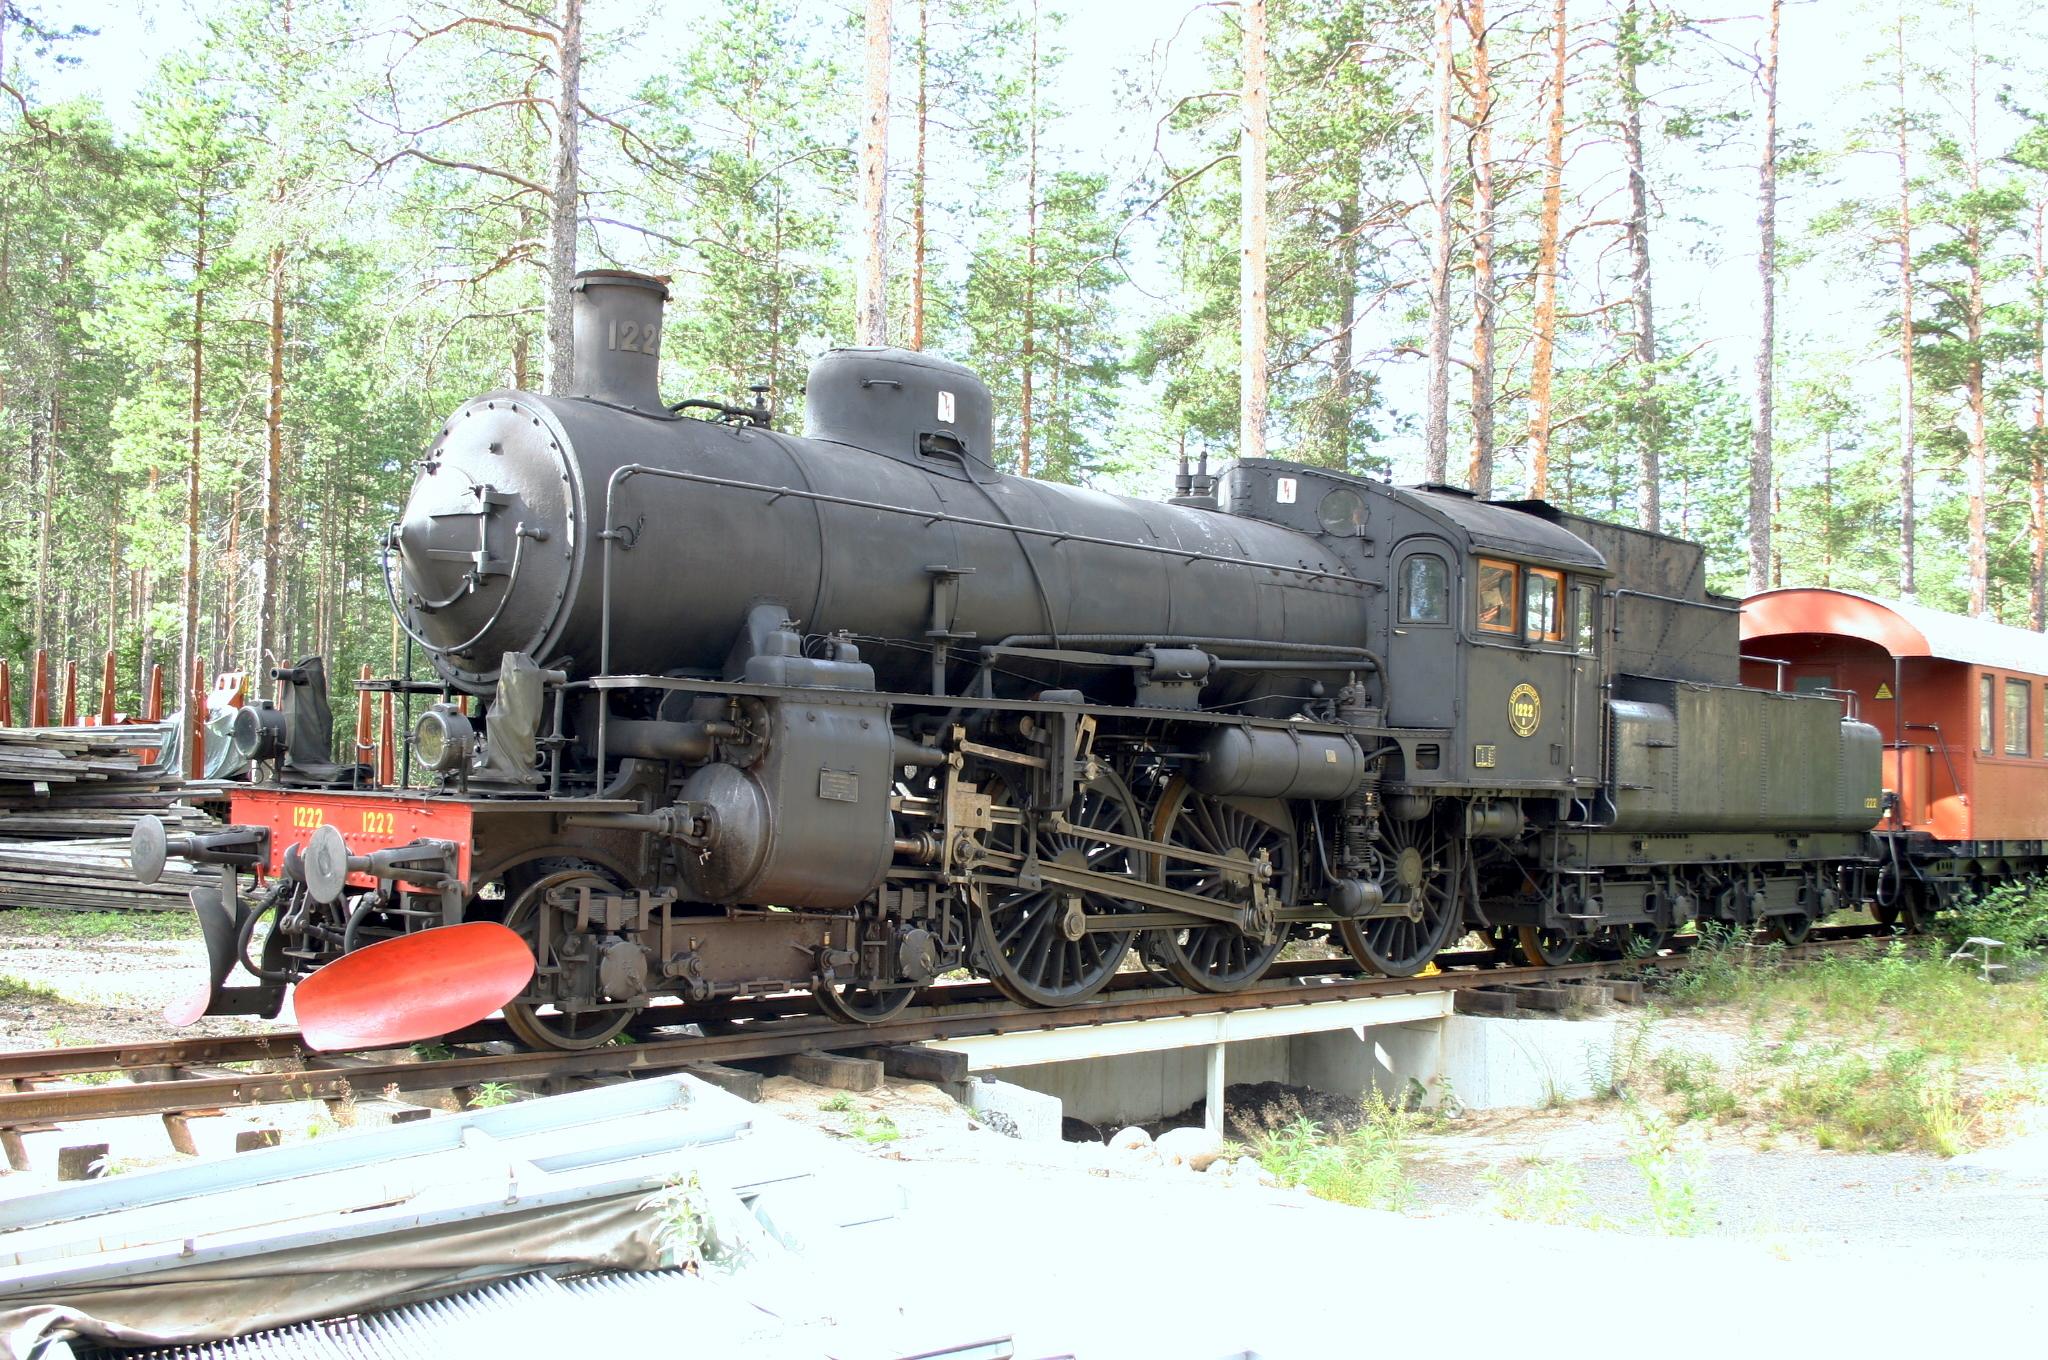 File:Dampflokomotive B 1222 Luleo 12.08.04.jpg